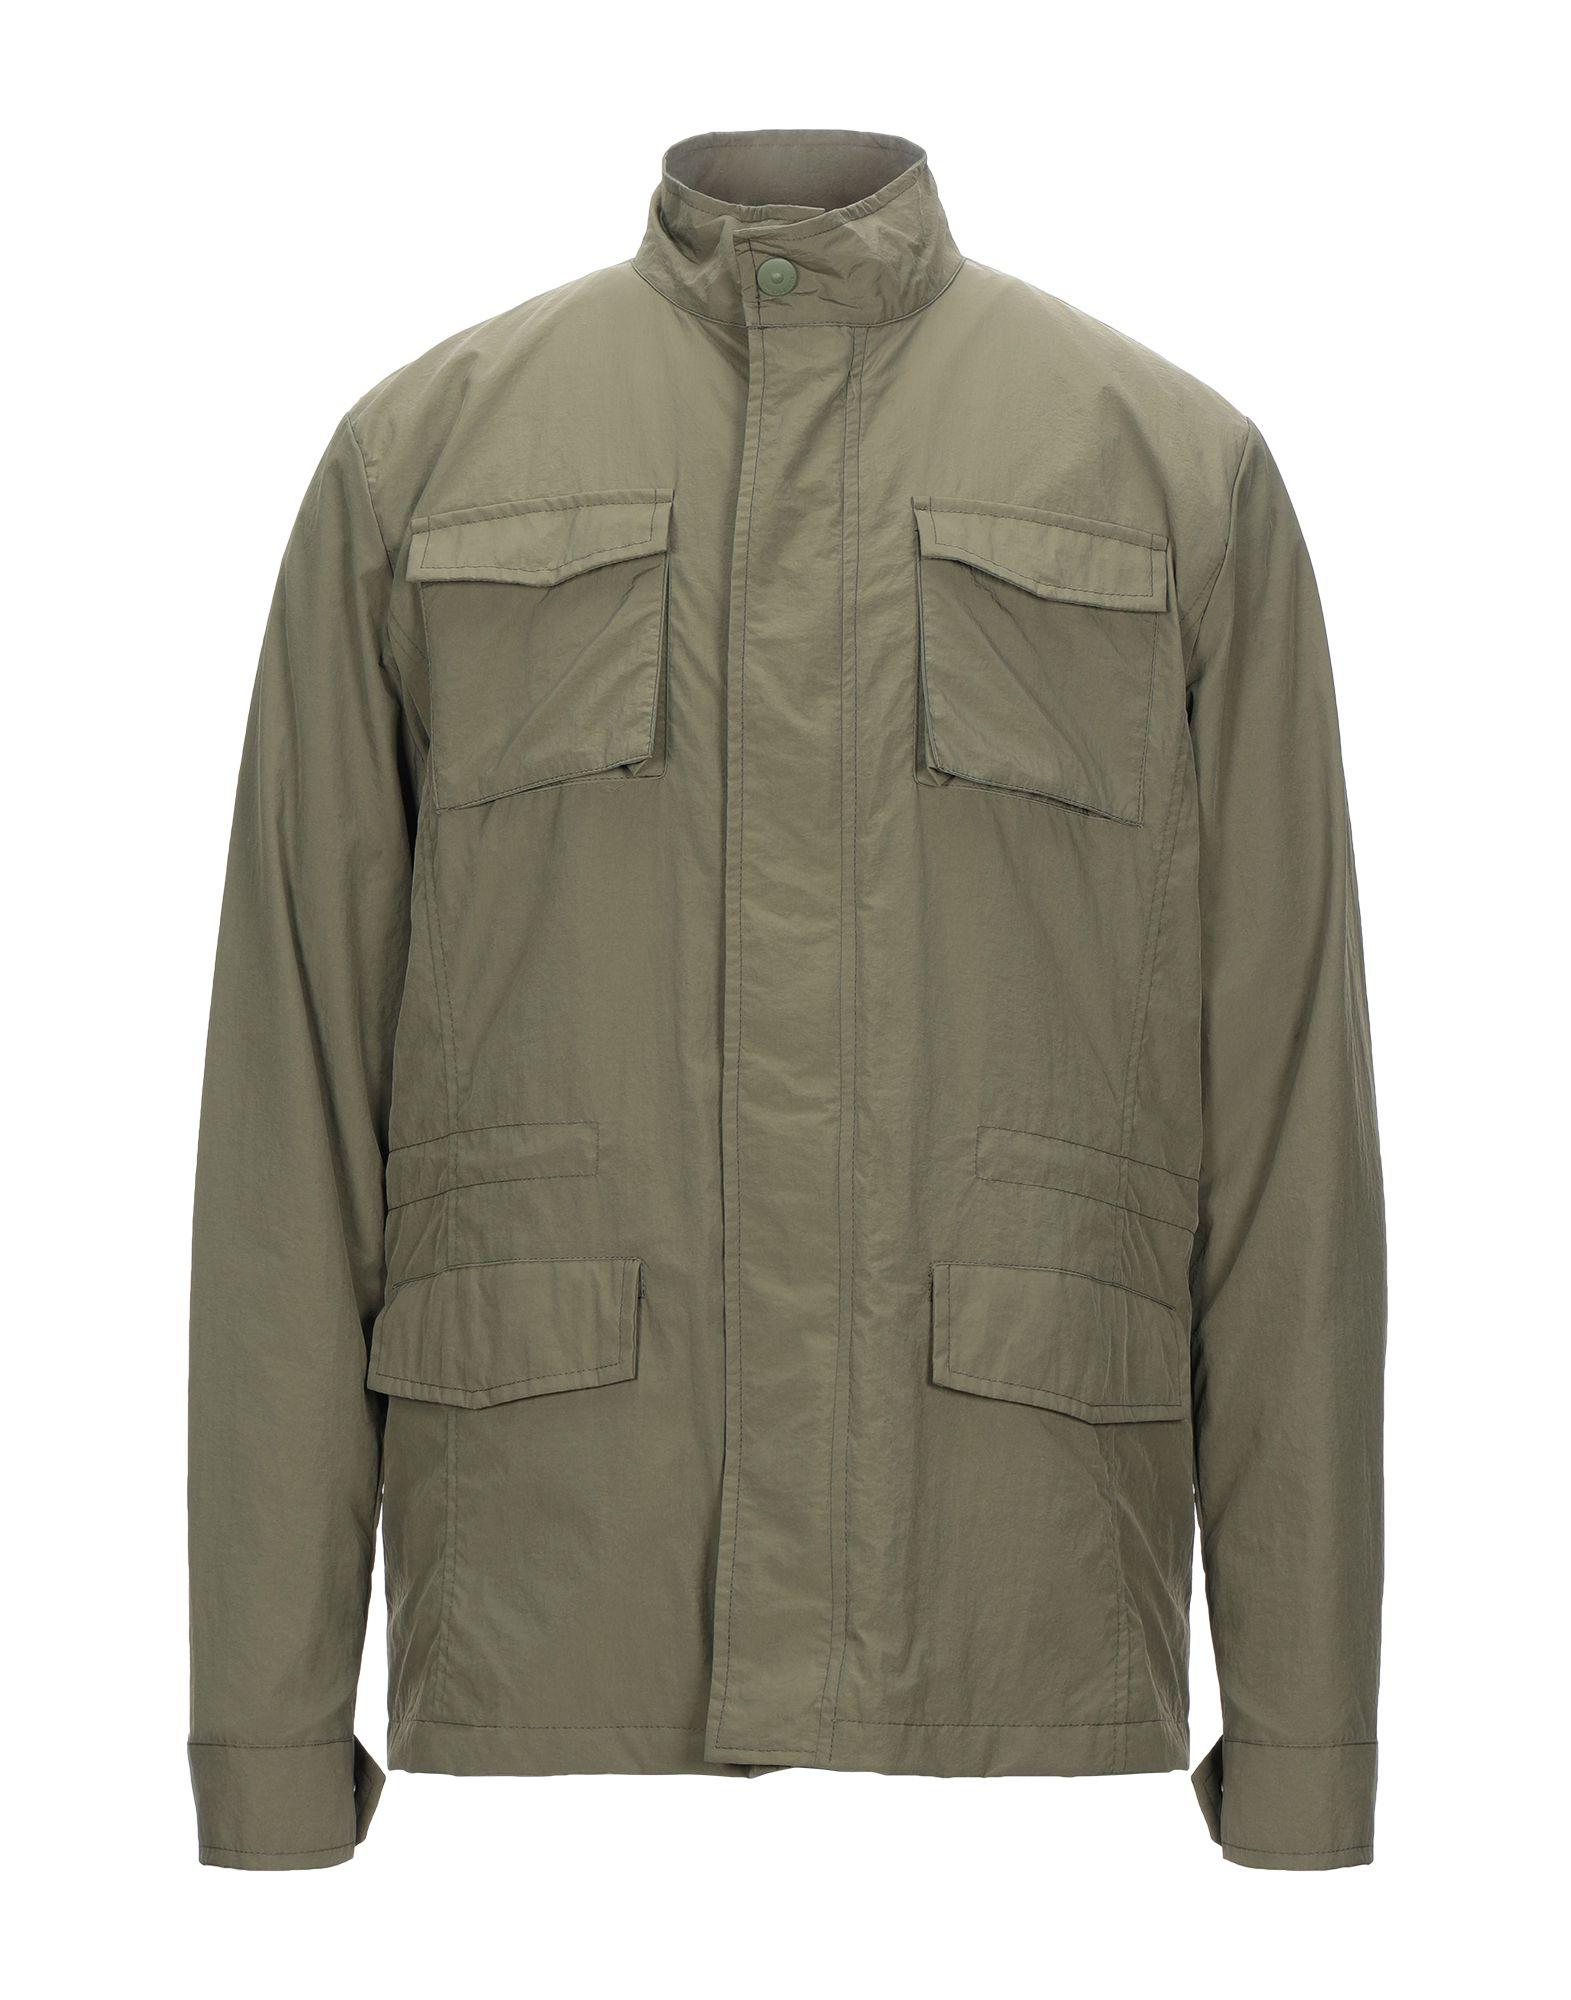 Фото - ARMATA DI MARE Куртка leather jacket giorgio di mare куртки короткие